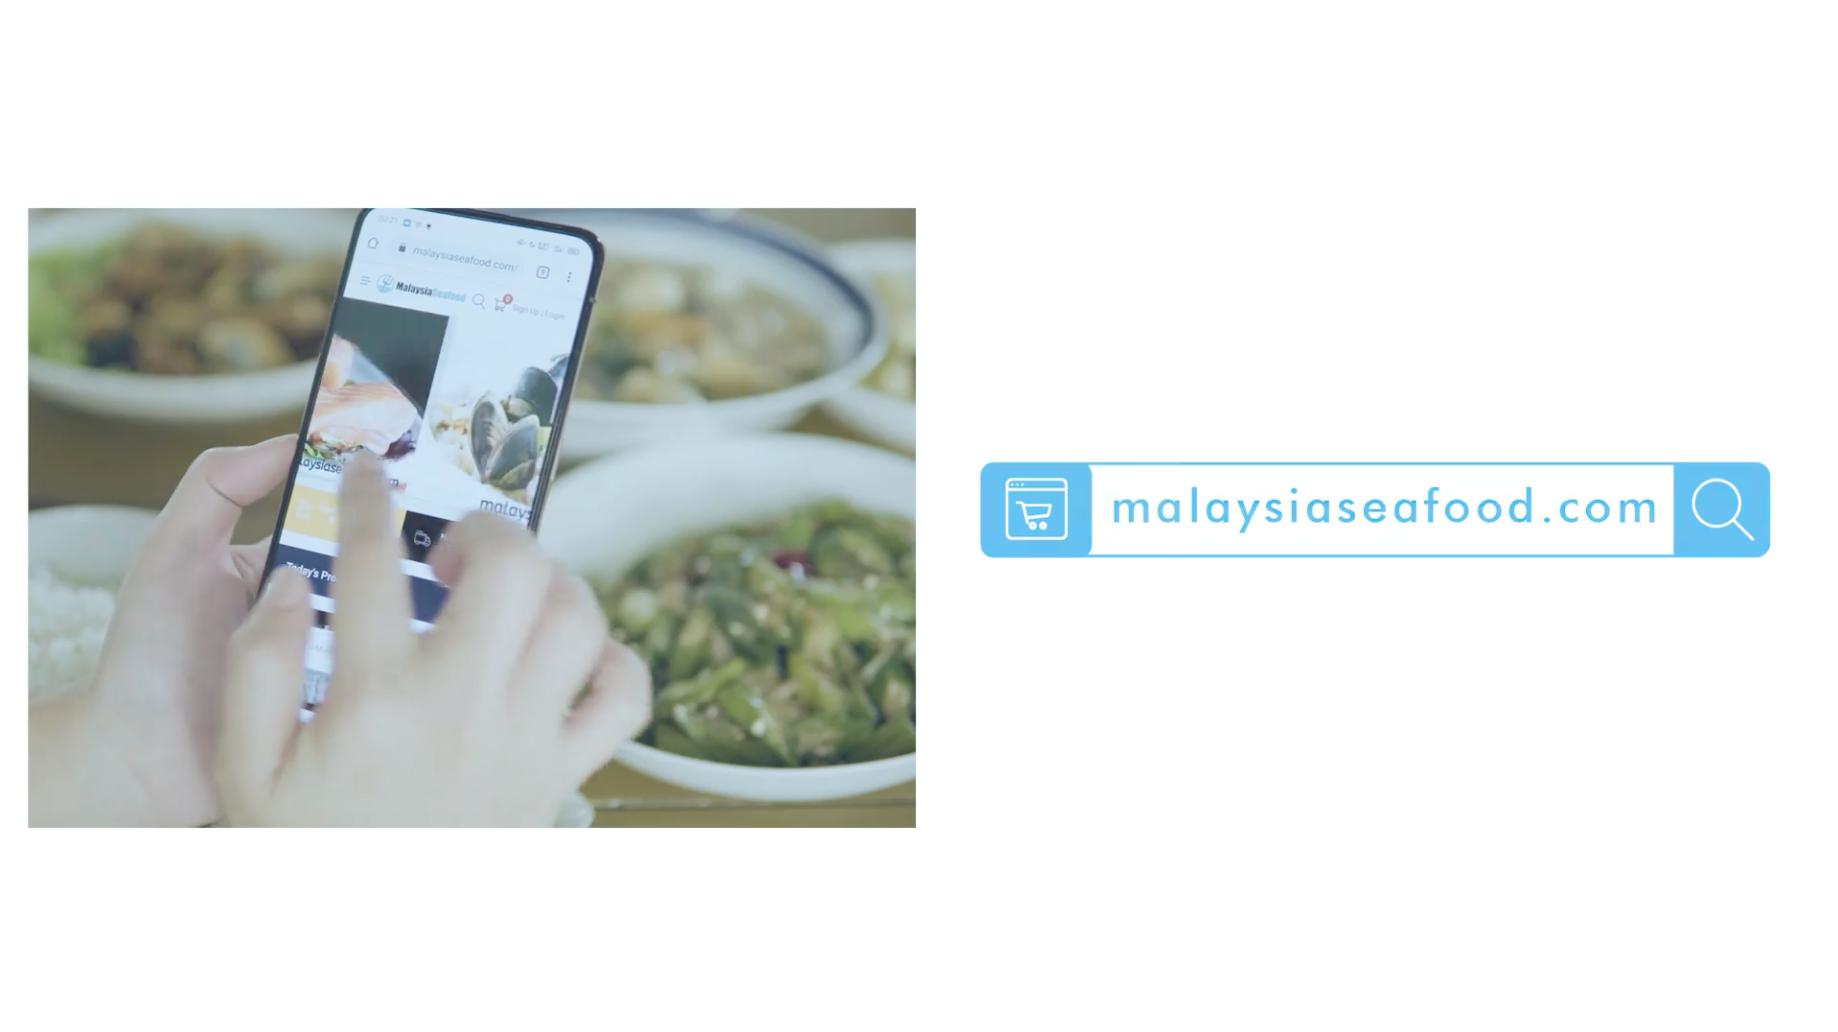 hand swiping malaysia seafood website